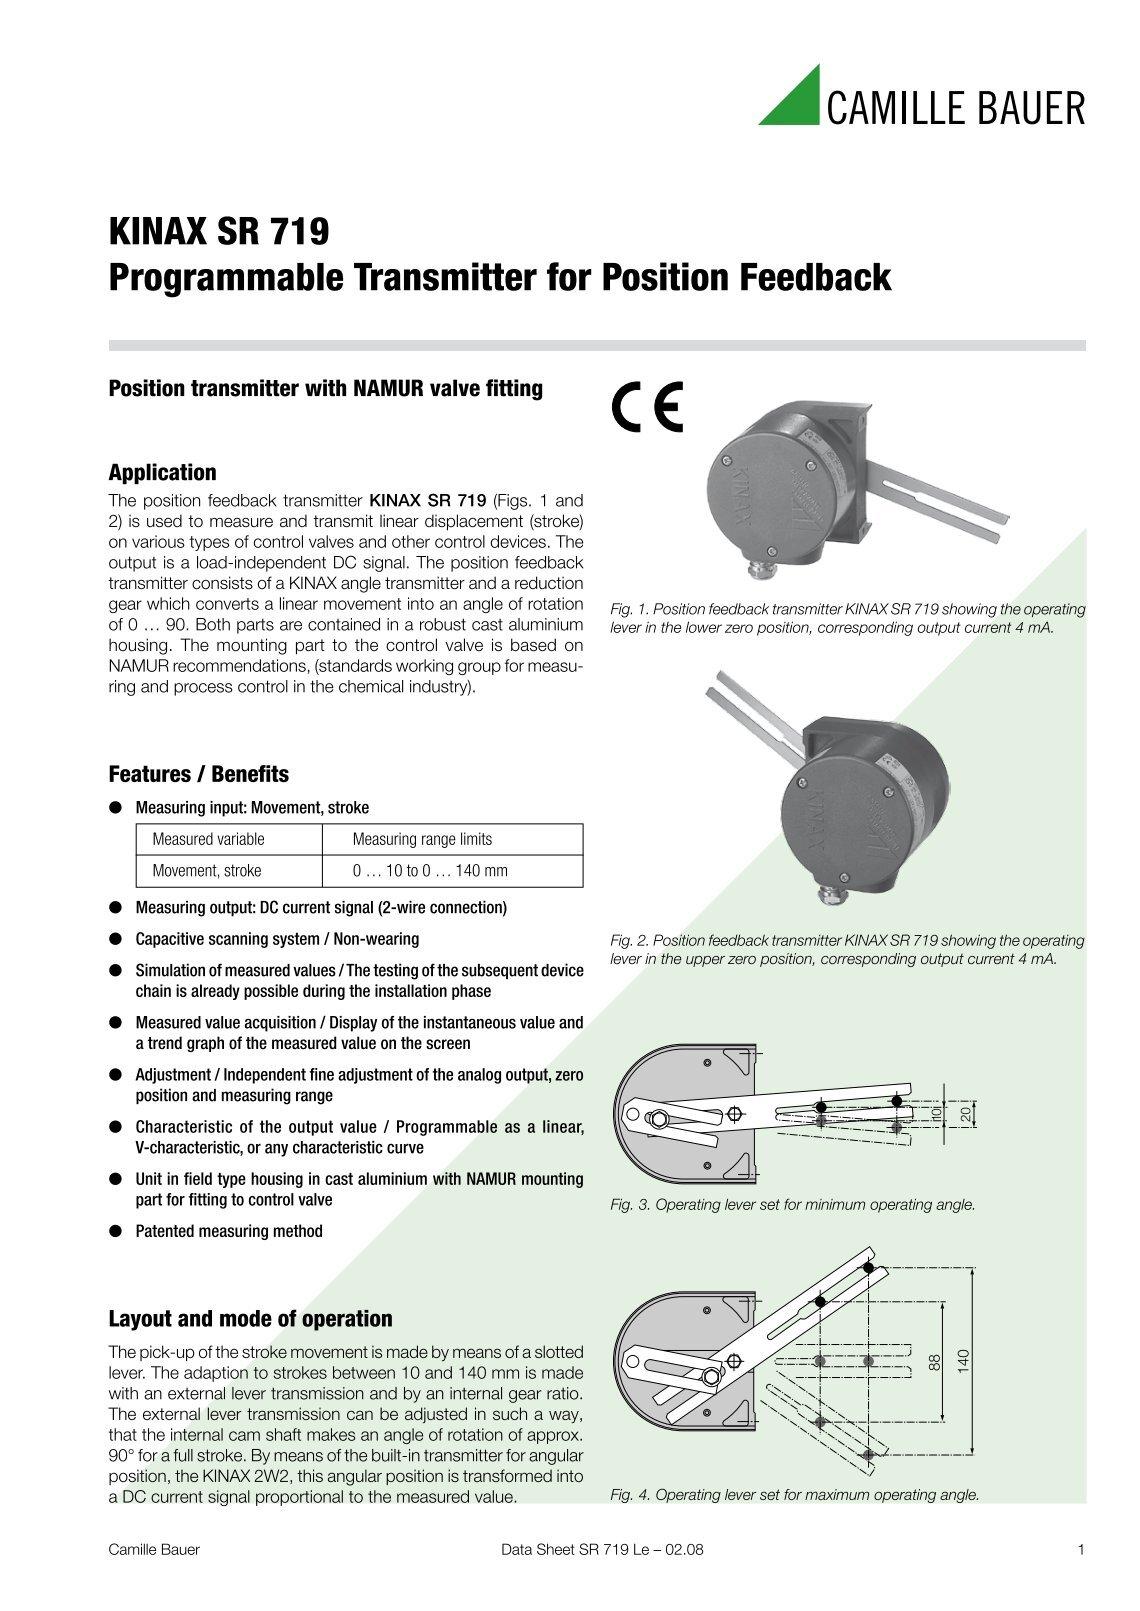 lvdt rs232 wiring diagram sv series digital brushless positioner daytronic lvdt wiring diagram detailed wiring diagrams